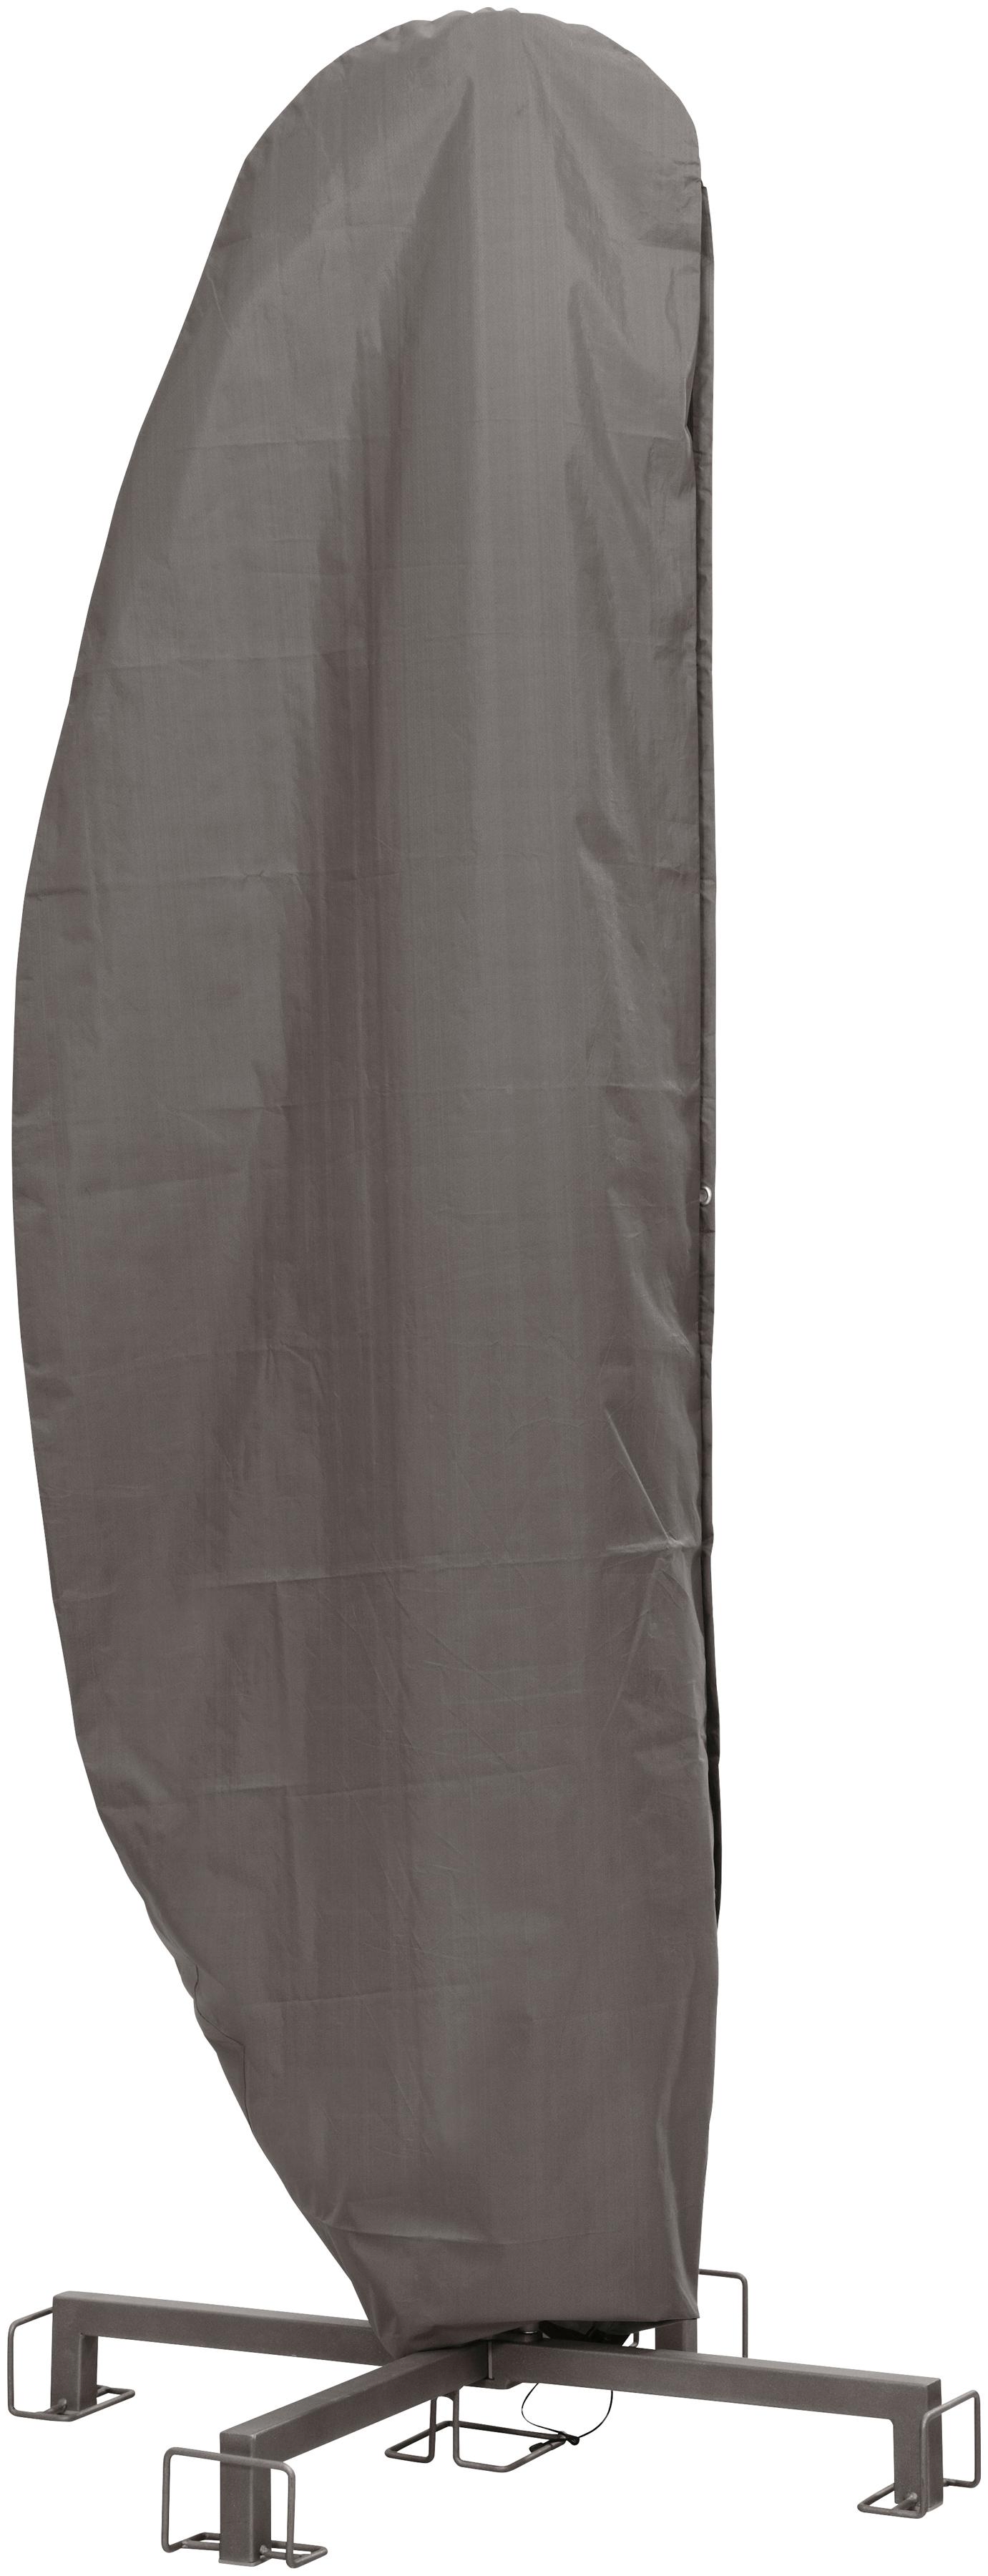 Best Schutzplane, (L/B): ca. 260x86 cm grau Gartenmöbel-Schutzhüllen Gartenmöbel Gartendeko Schutzplane